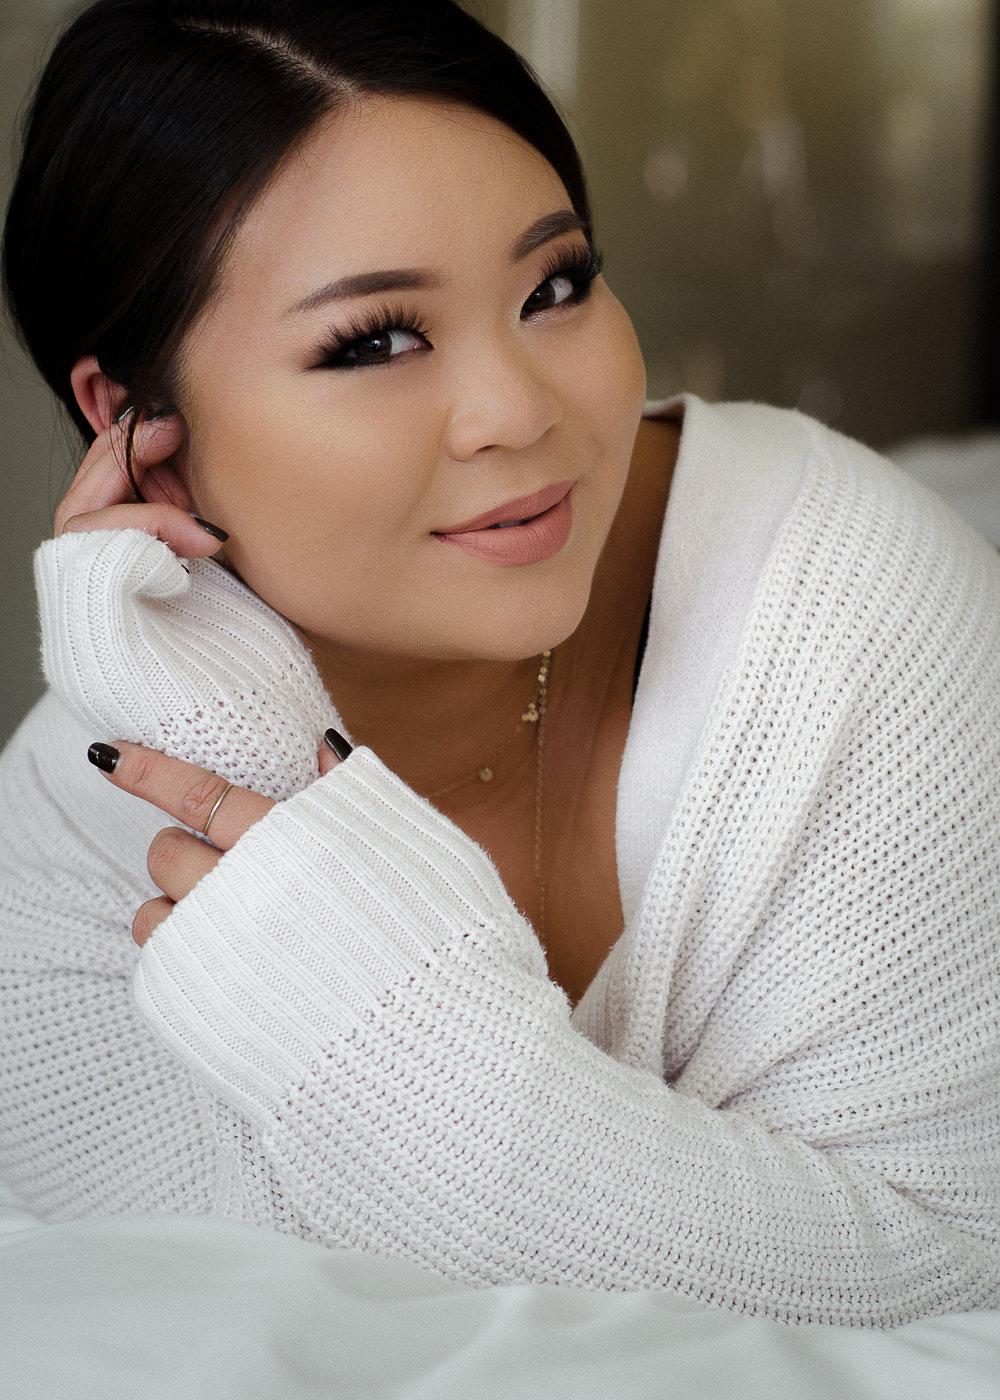 Los Angeles Makeup Artist Crystal Wei Personal Branding Headshot Miranda Kelton Photography